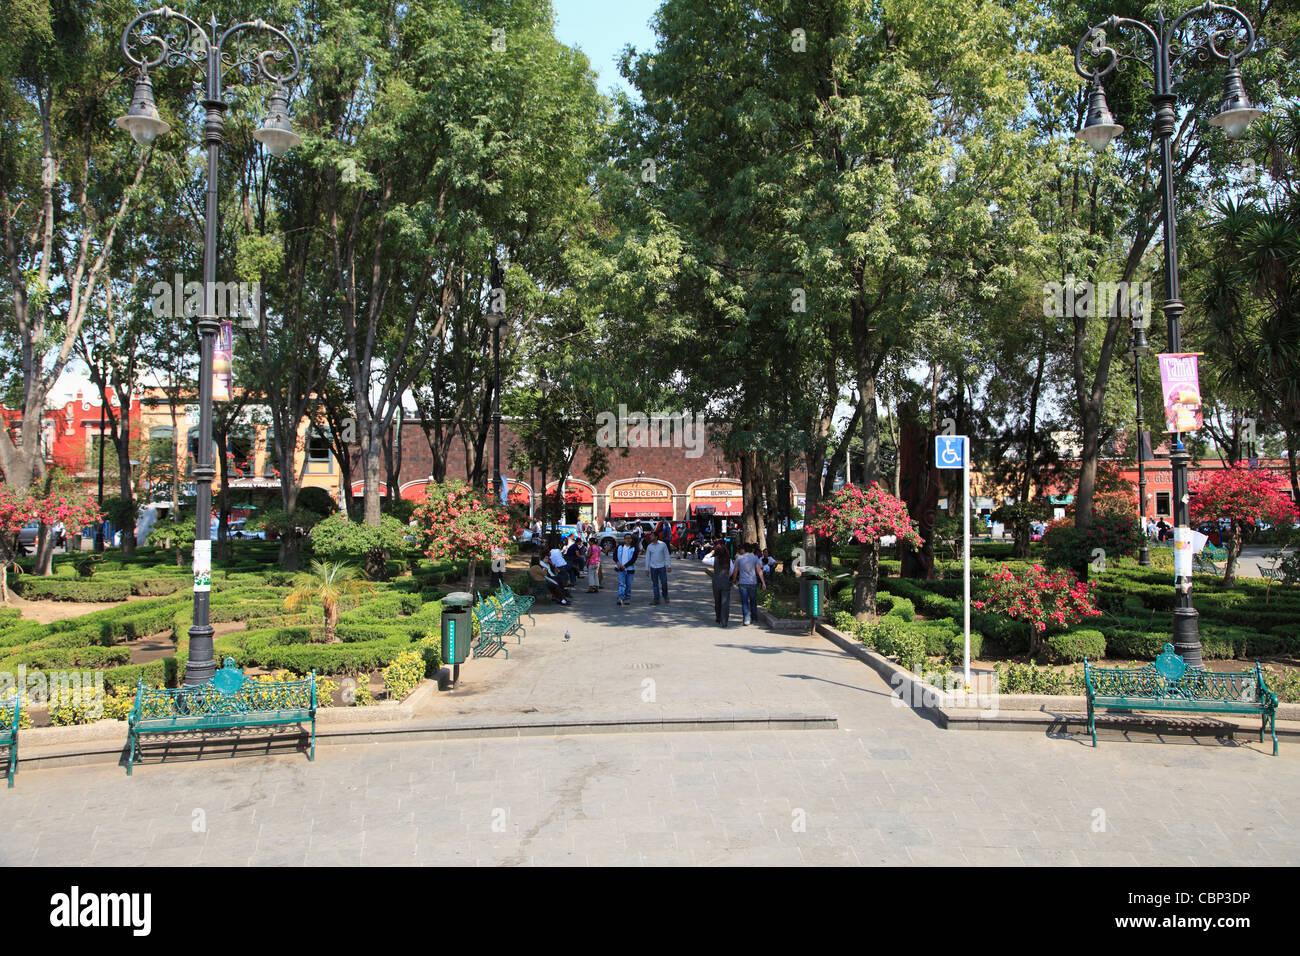 Plaza Hidalgo Coyoacan Mexico City Mexico North America Stock